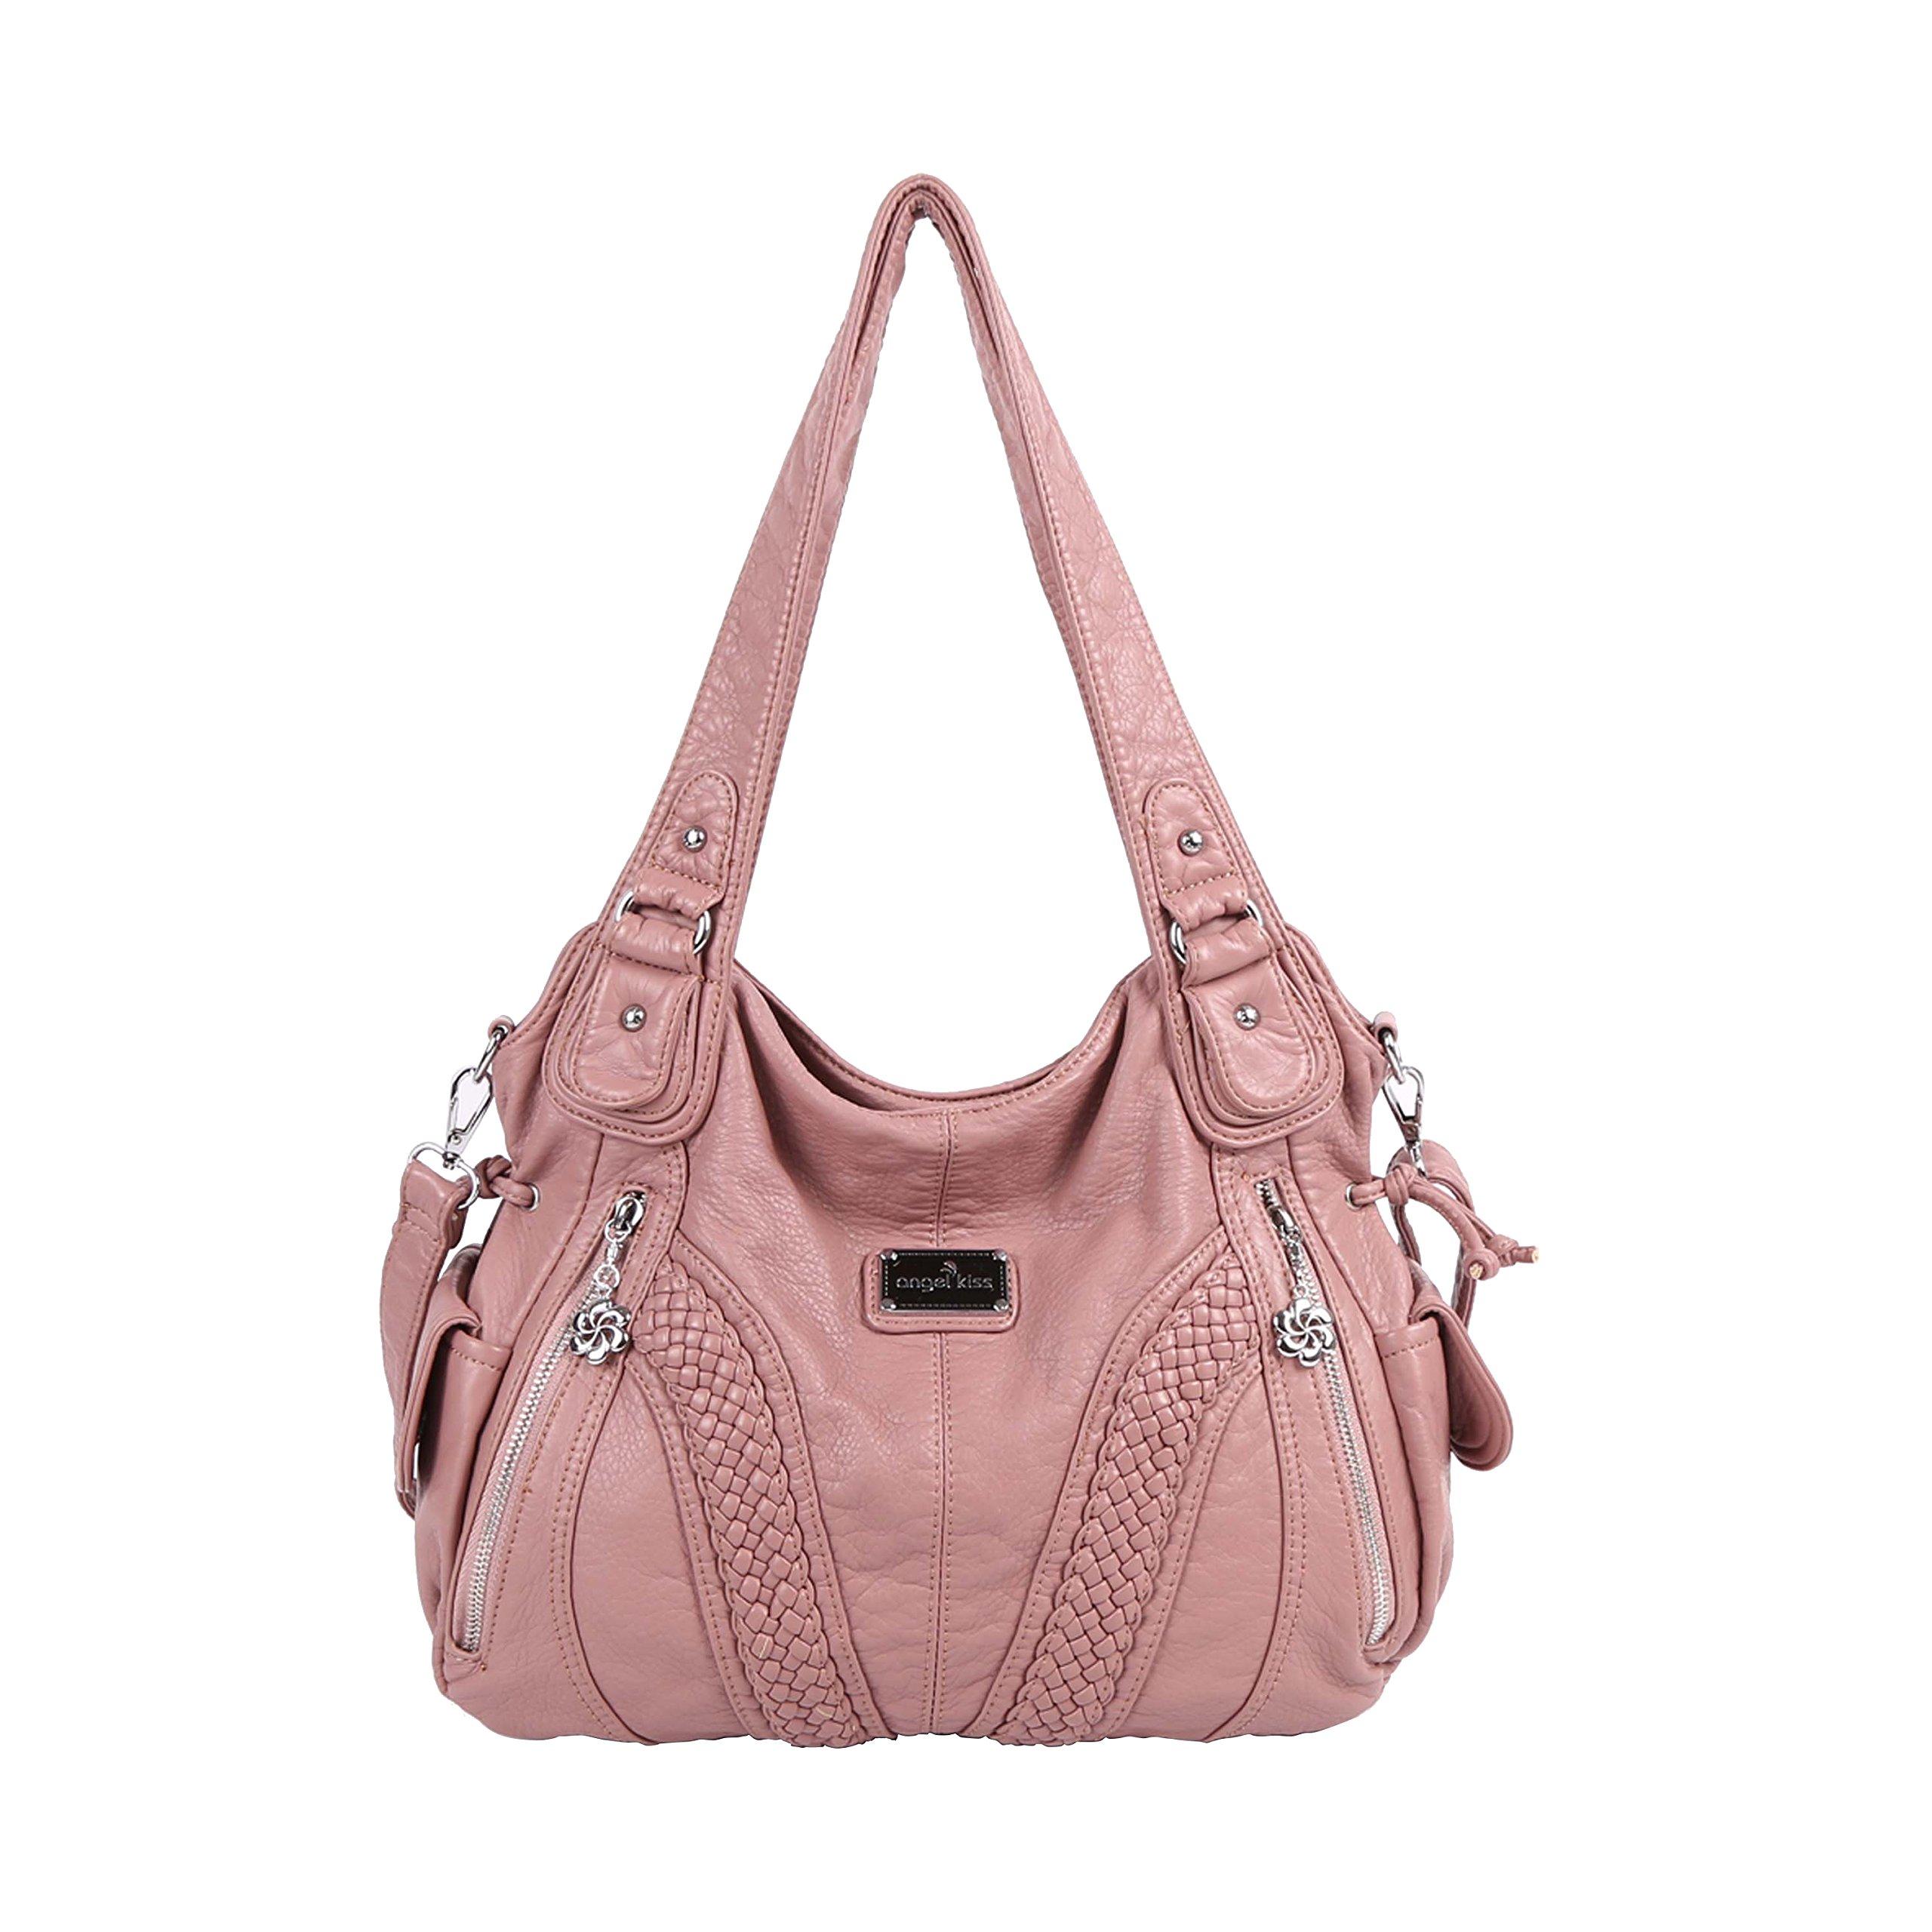 Angelkiss Women Top Handle Satchel Handbags Shoulder Bag Messenger Tote Washed Leather Purses Bag (Pink)